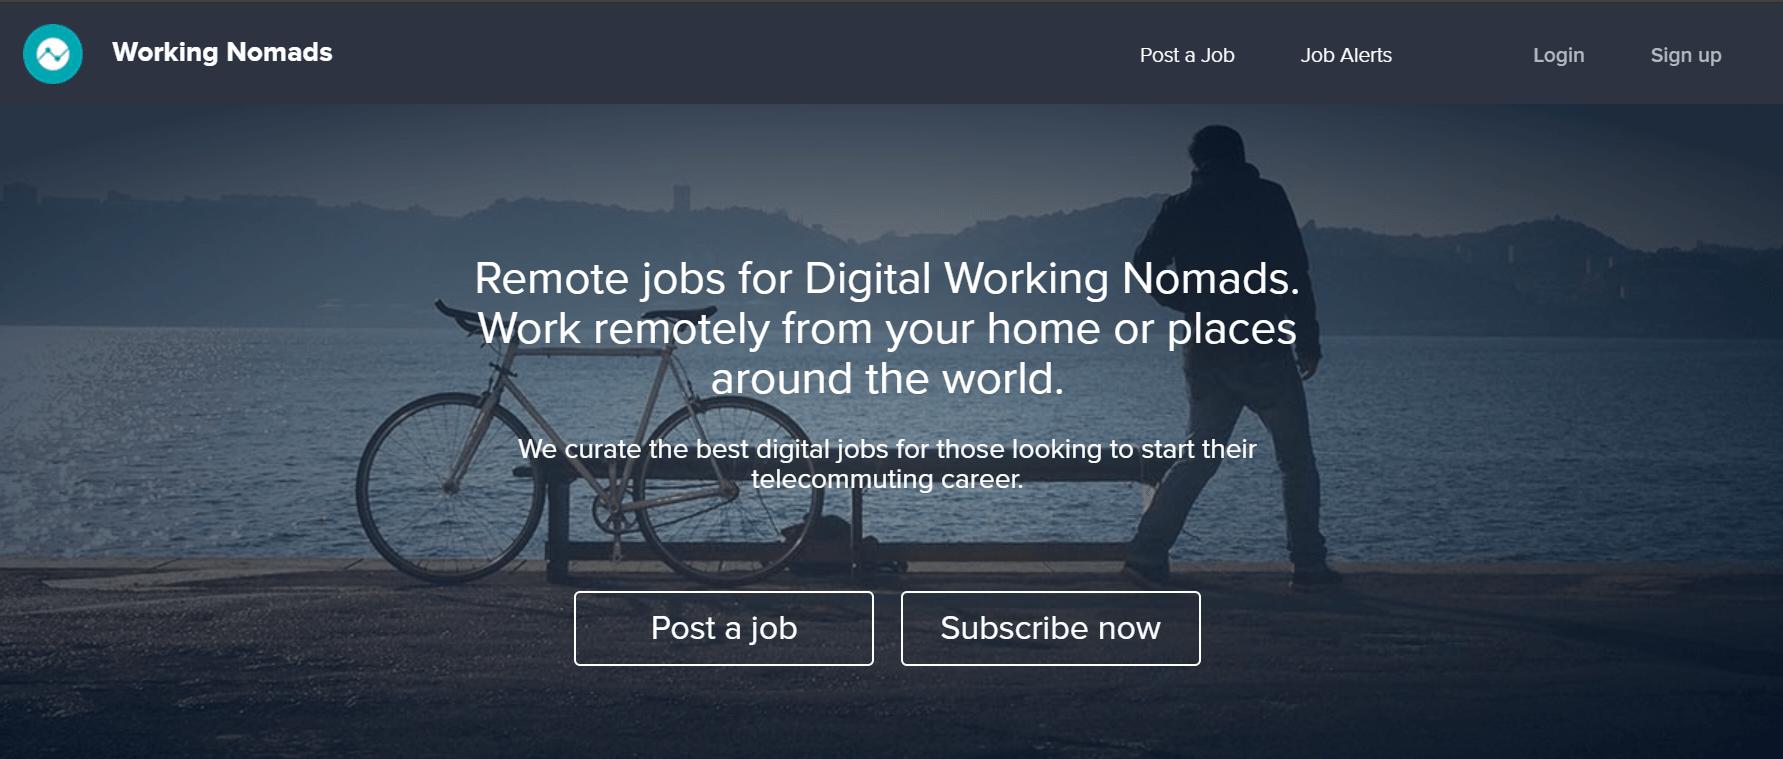 working nomads image